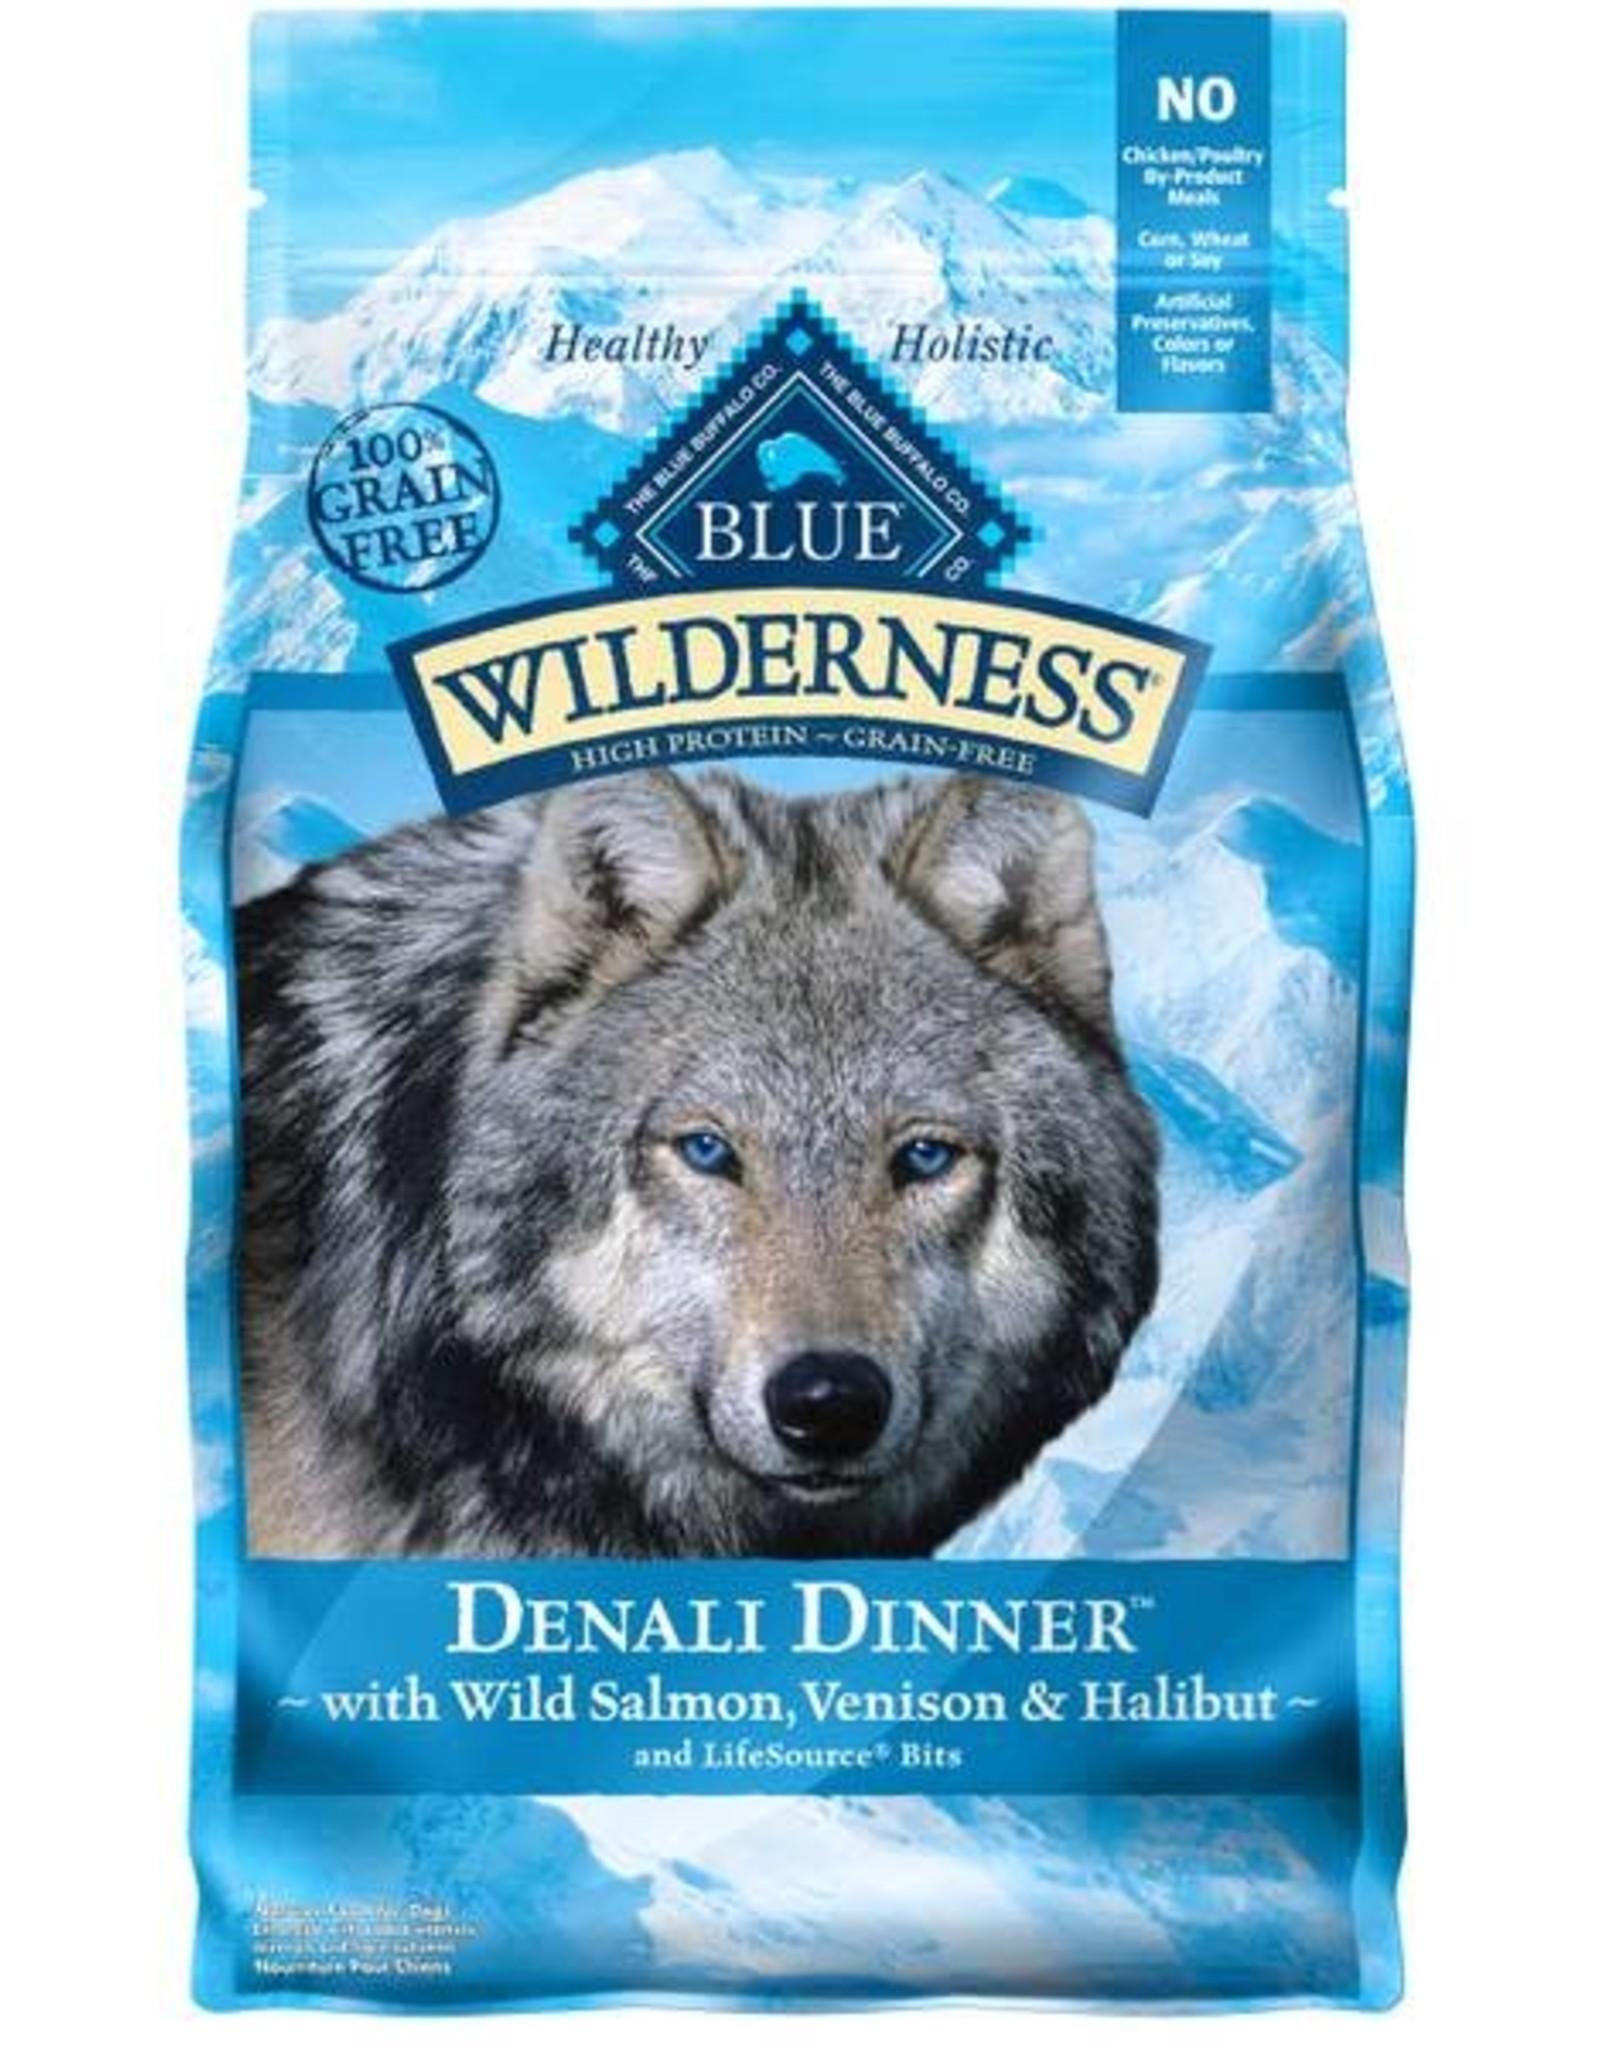 Blue Buffalo Blue Buffalo  Wilderness Food for Dogs, Denali Dinner, with Wild Salmon, Venison & Halibut 4 lb